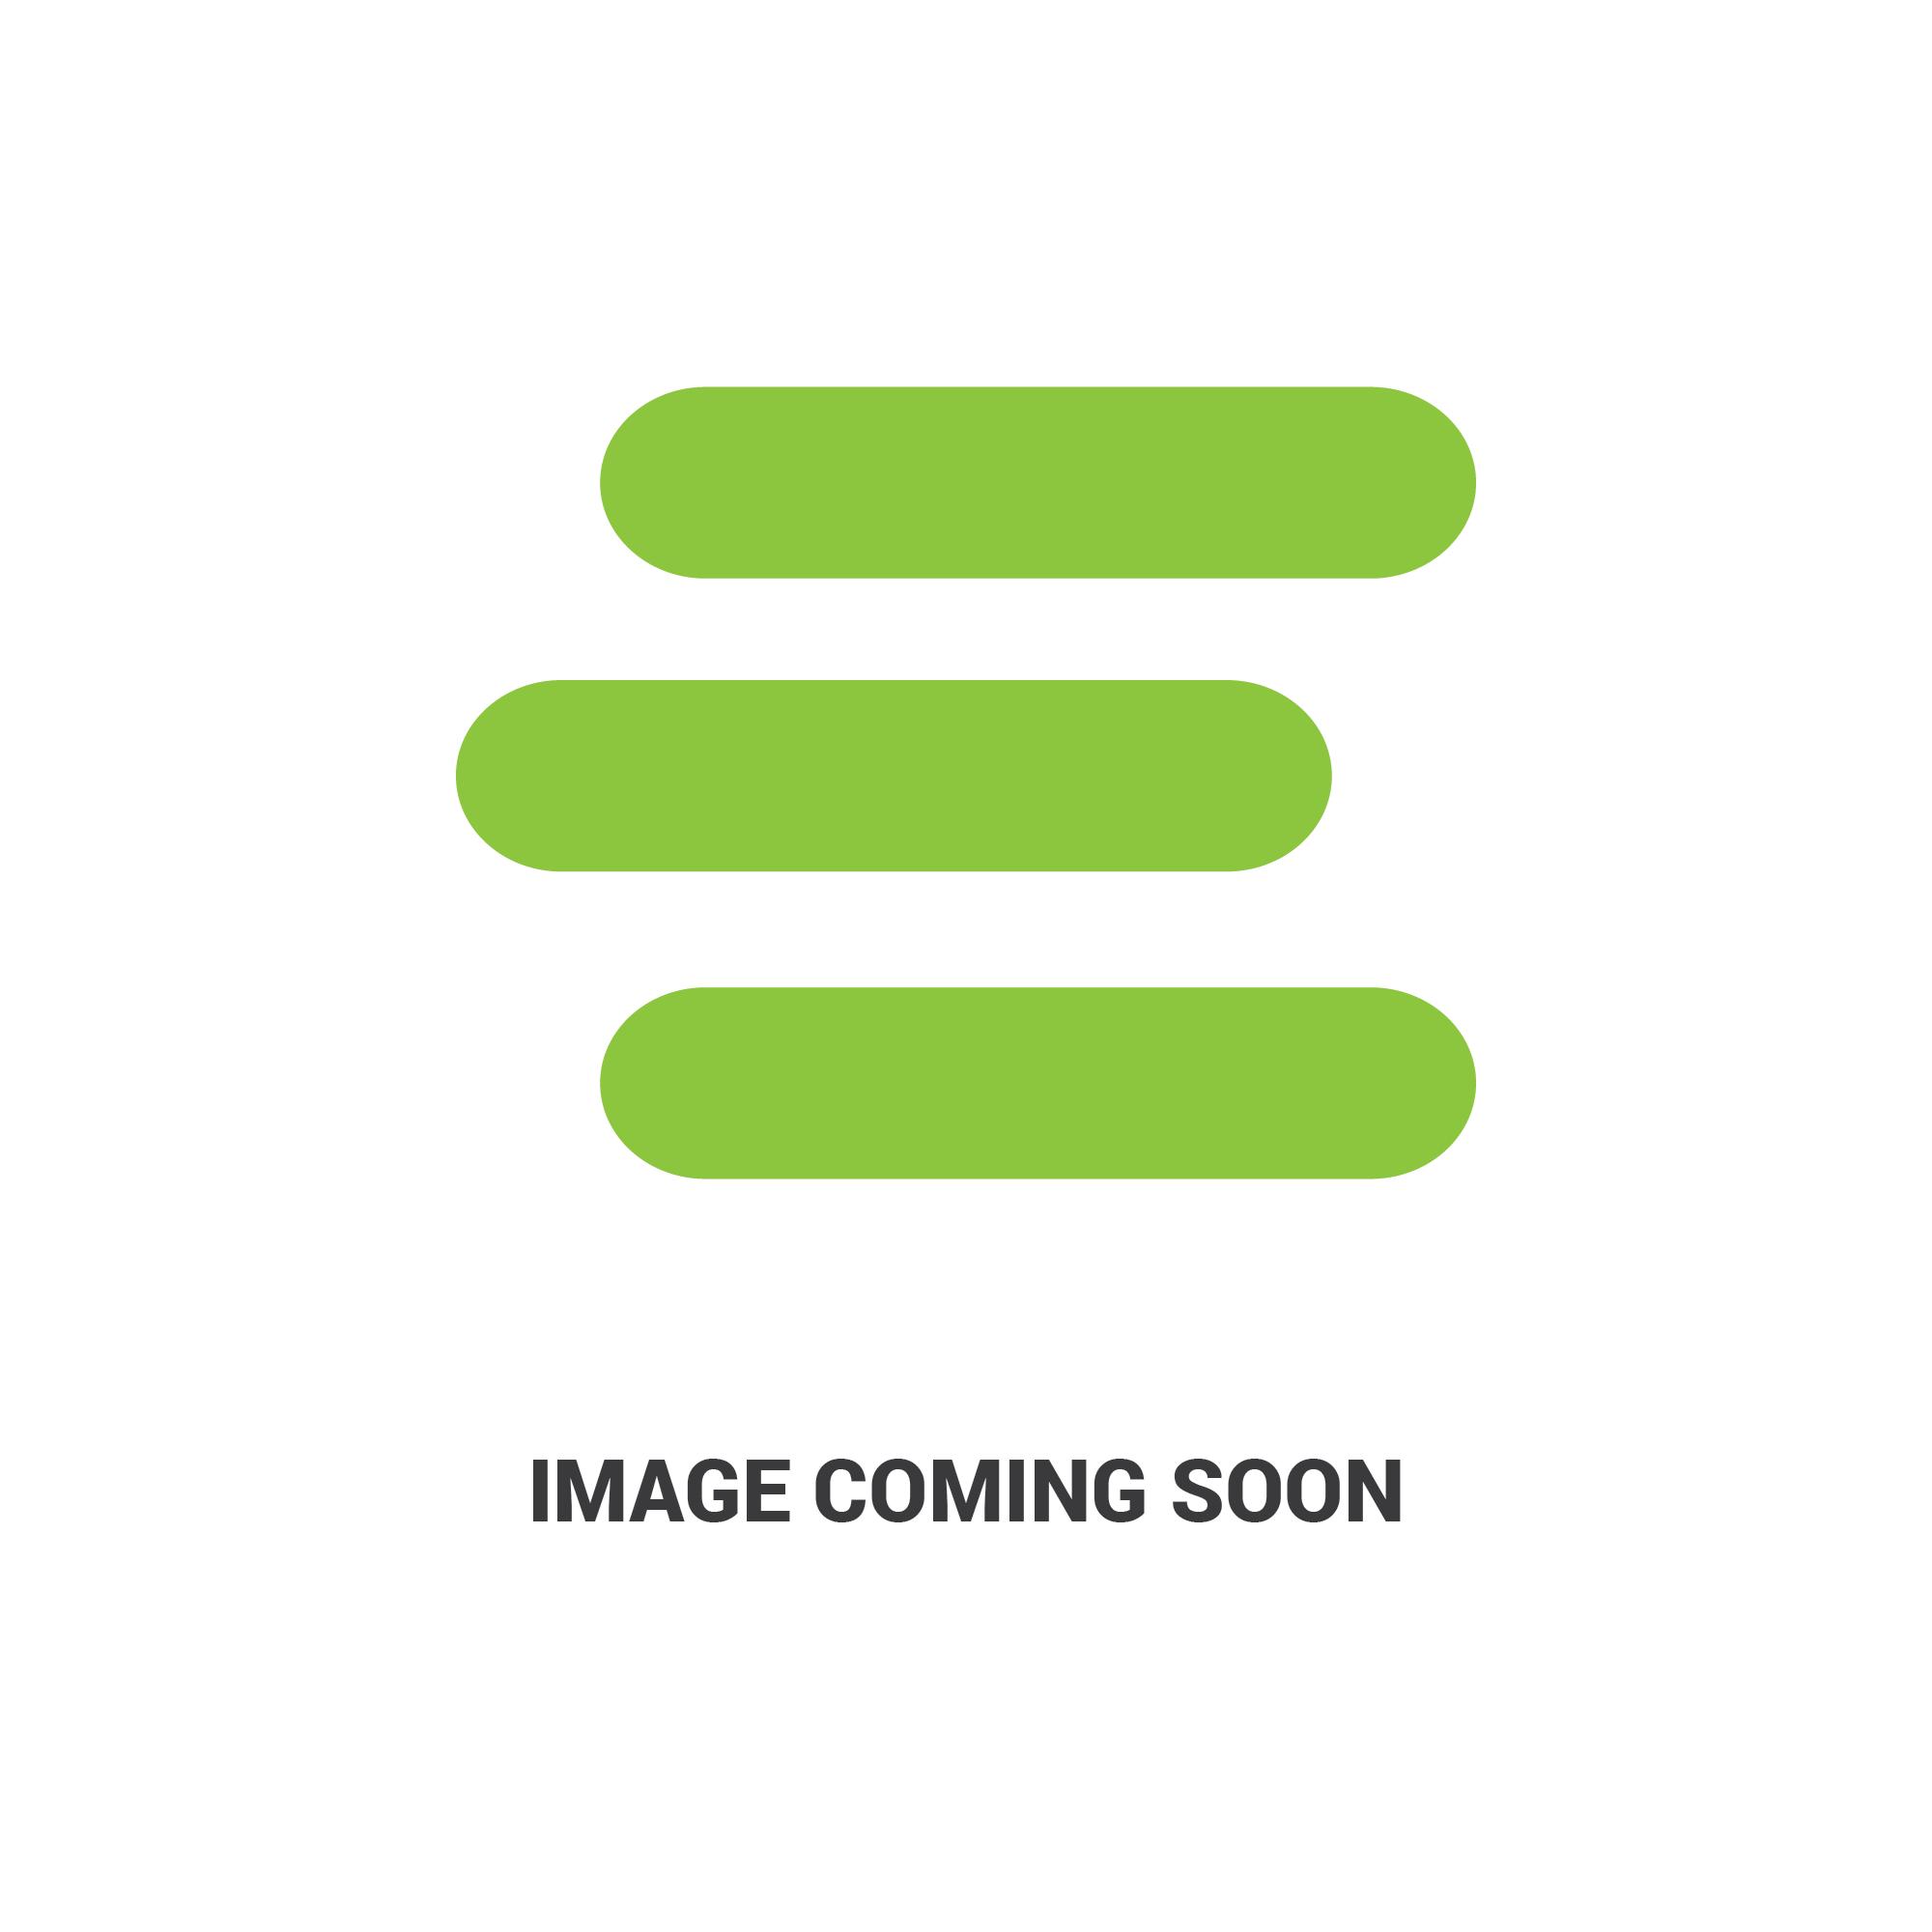 E-66751761116.jpg